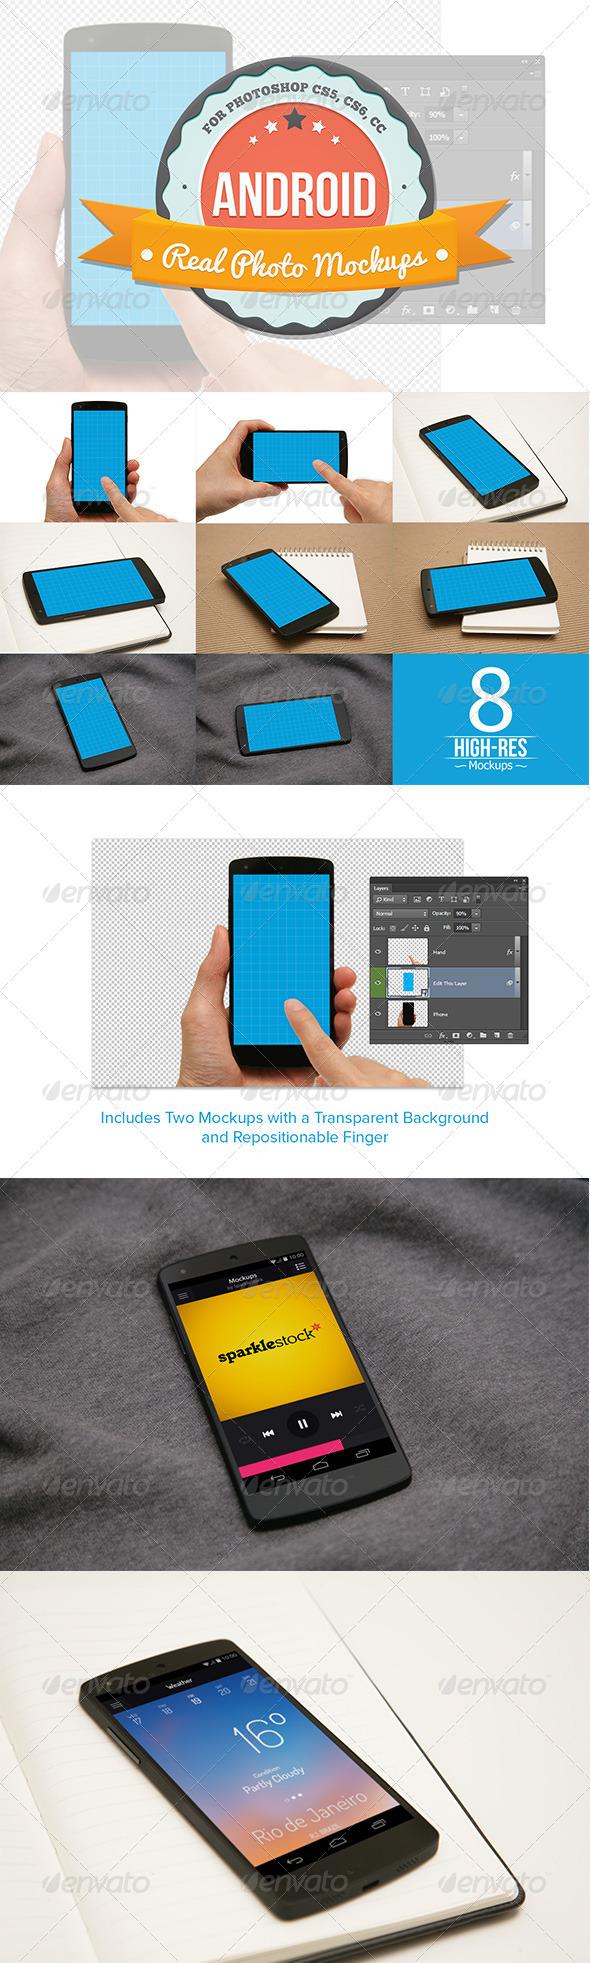 8 Android Mockups - Mobile Displays